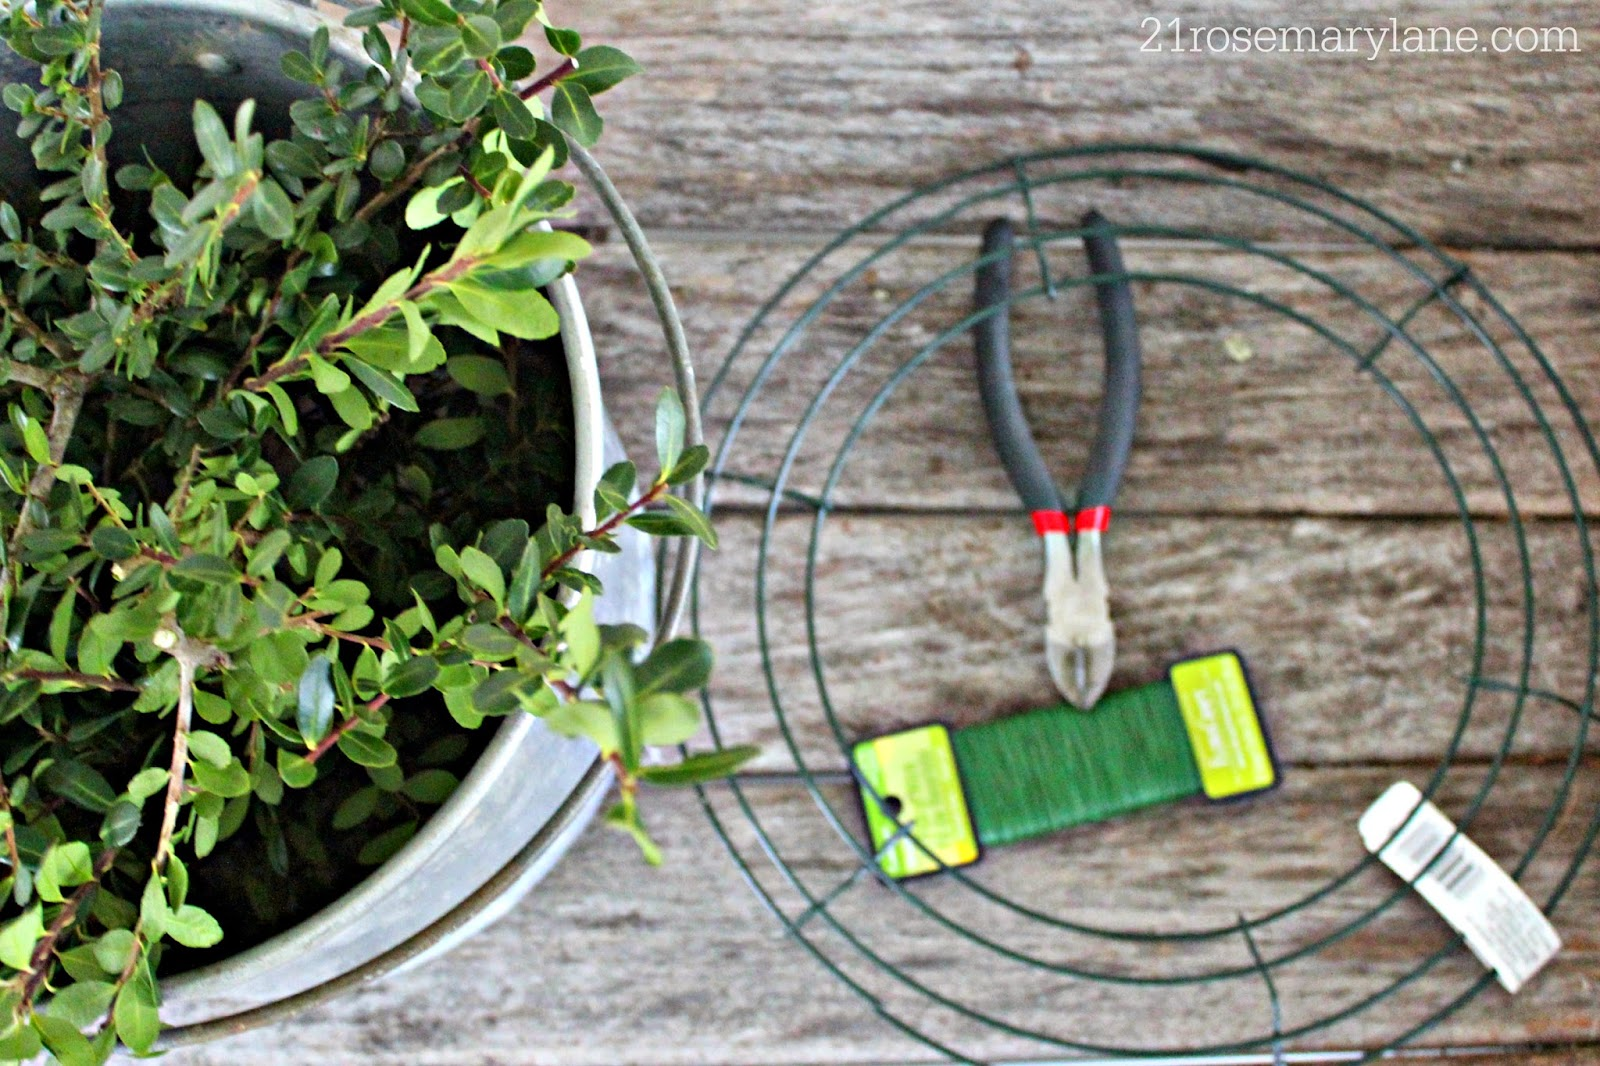 21 Rosemary Lane: Easy to Make Boxwood Wreath